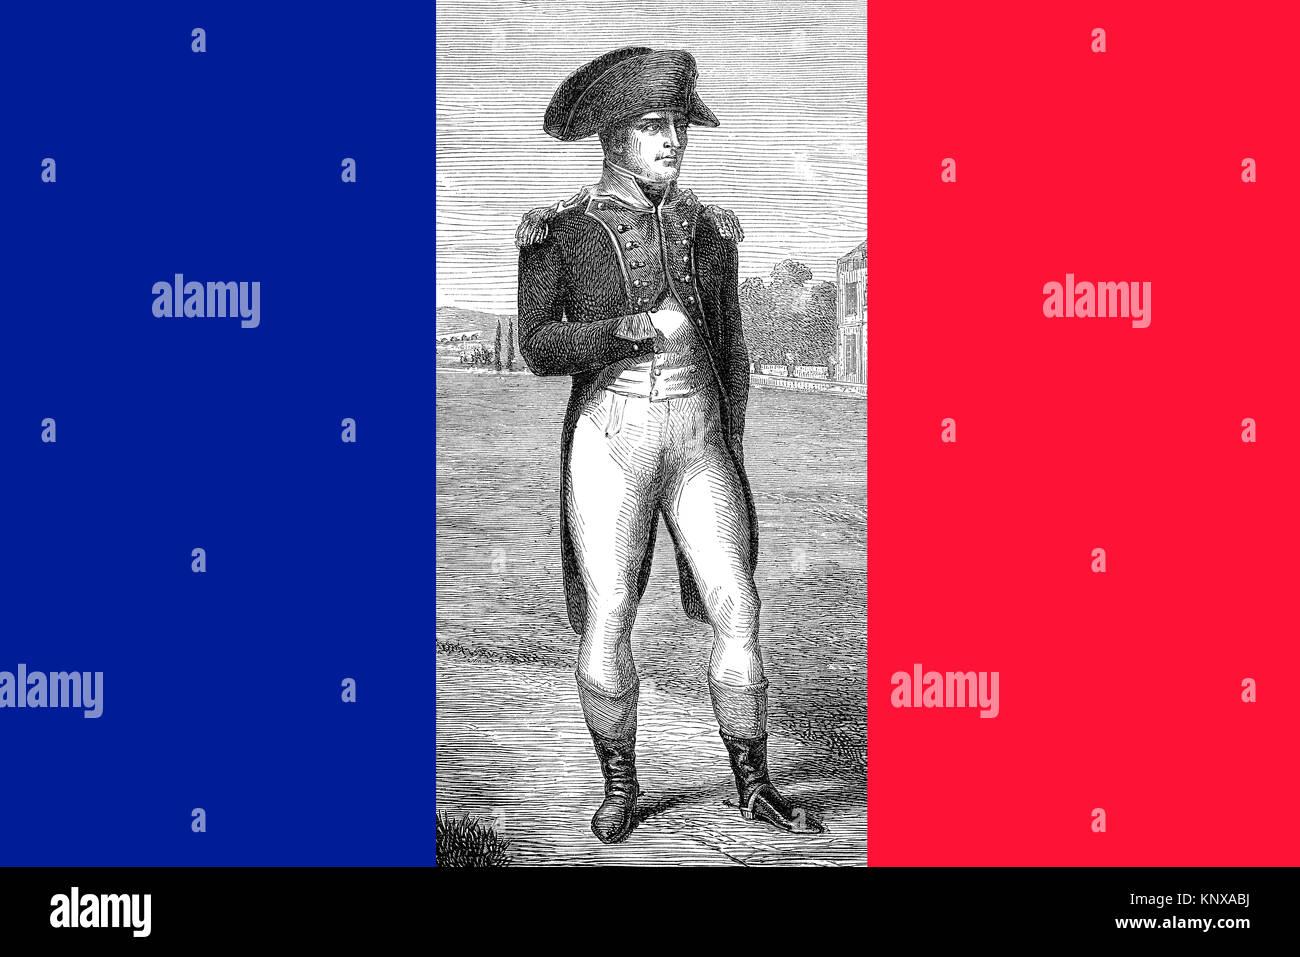 Napoleon Bonaparte, Emperor Napoleon I, 1769 - 1821, French general, statesman and emperor - Stock Image